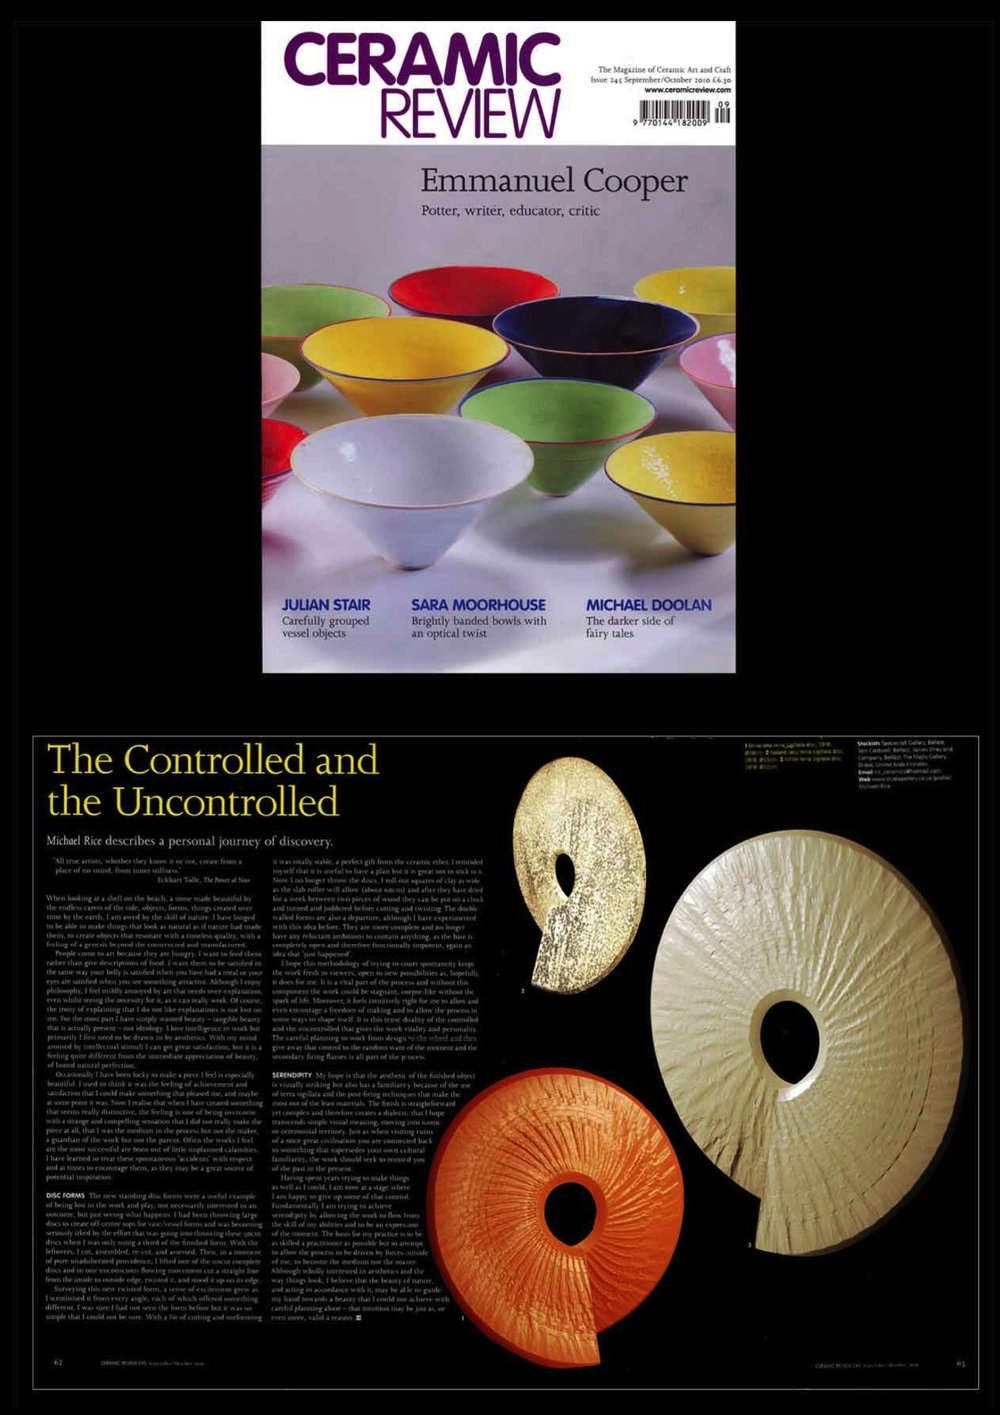 Ceramic Review Article 2010